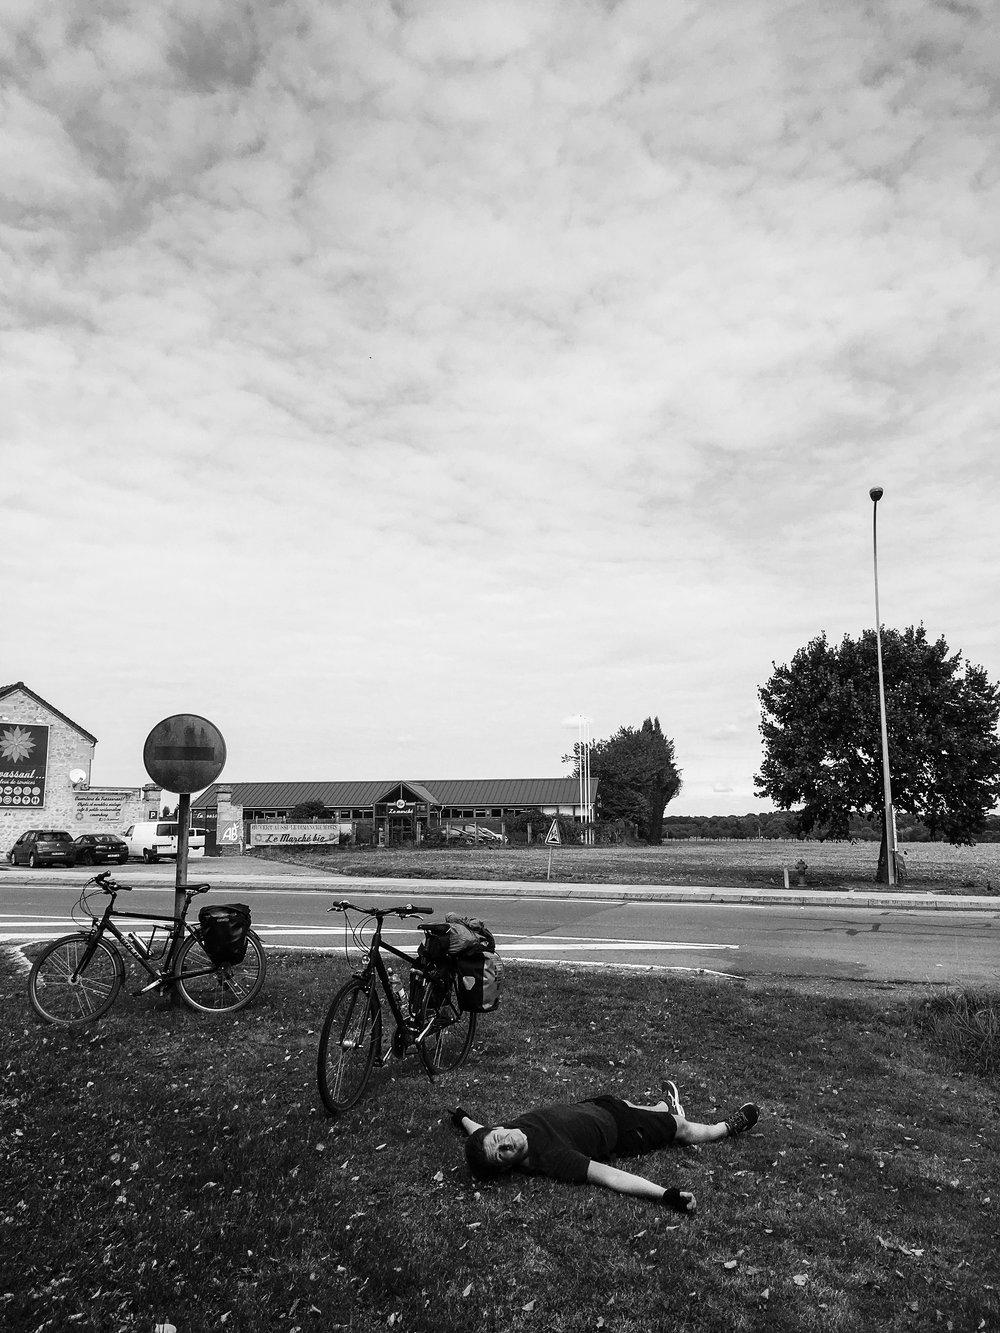 Tom_Oliver_Payne_London_to_Paris_Cycle-14.jpg